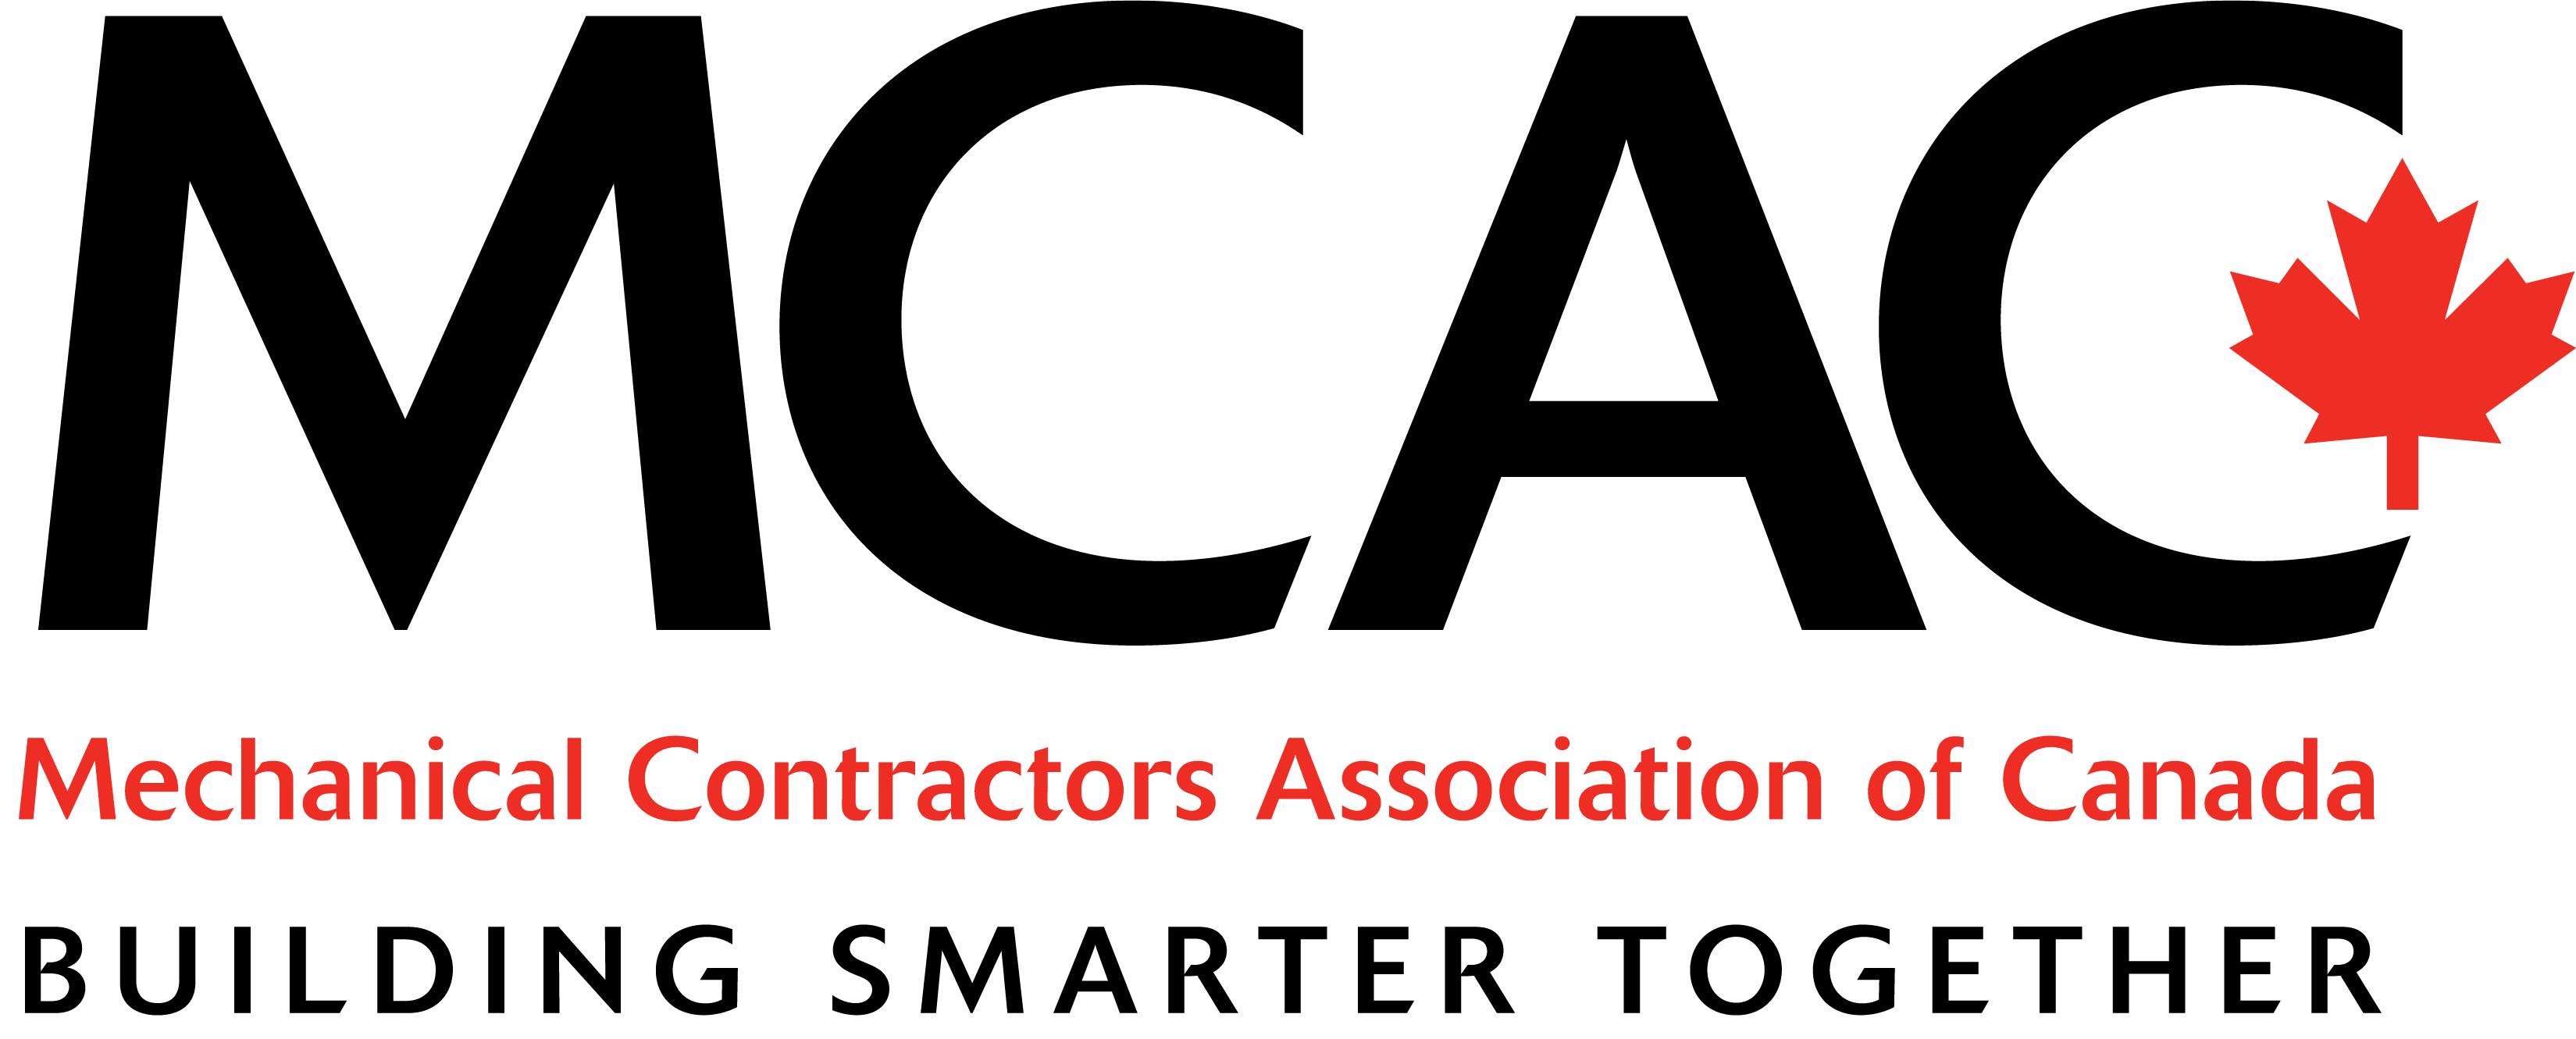 MCA Canada's Construction Education Council Annual Fundraising Golf Tournament logo